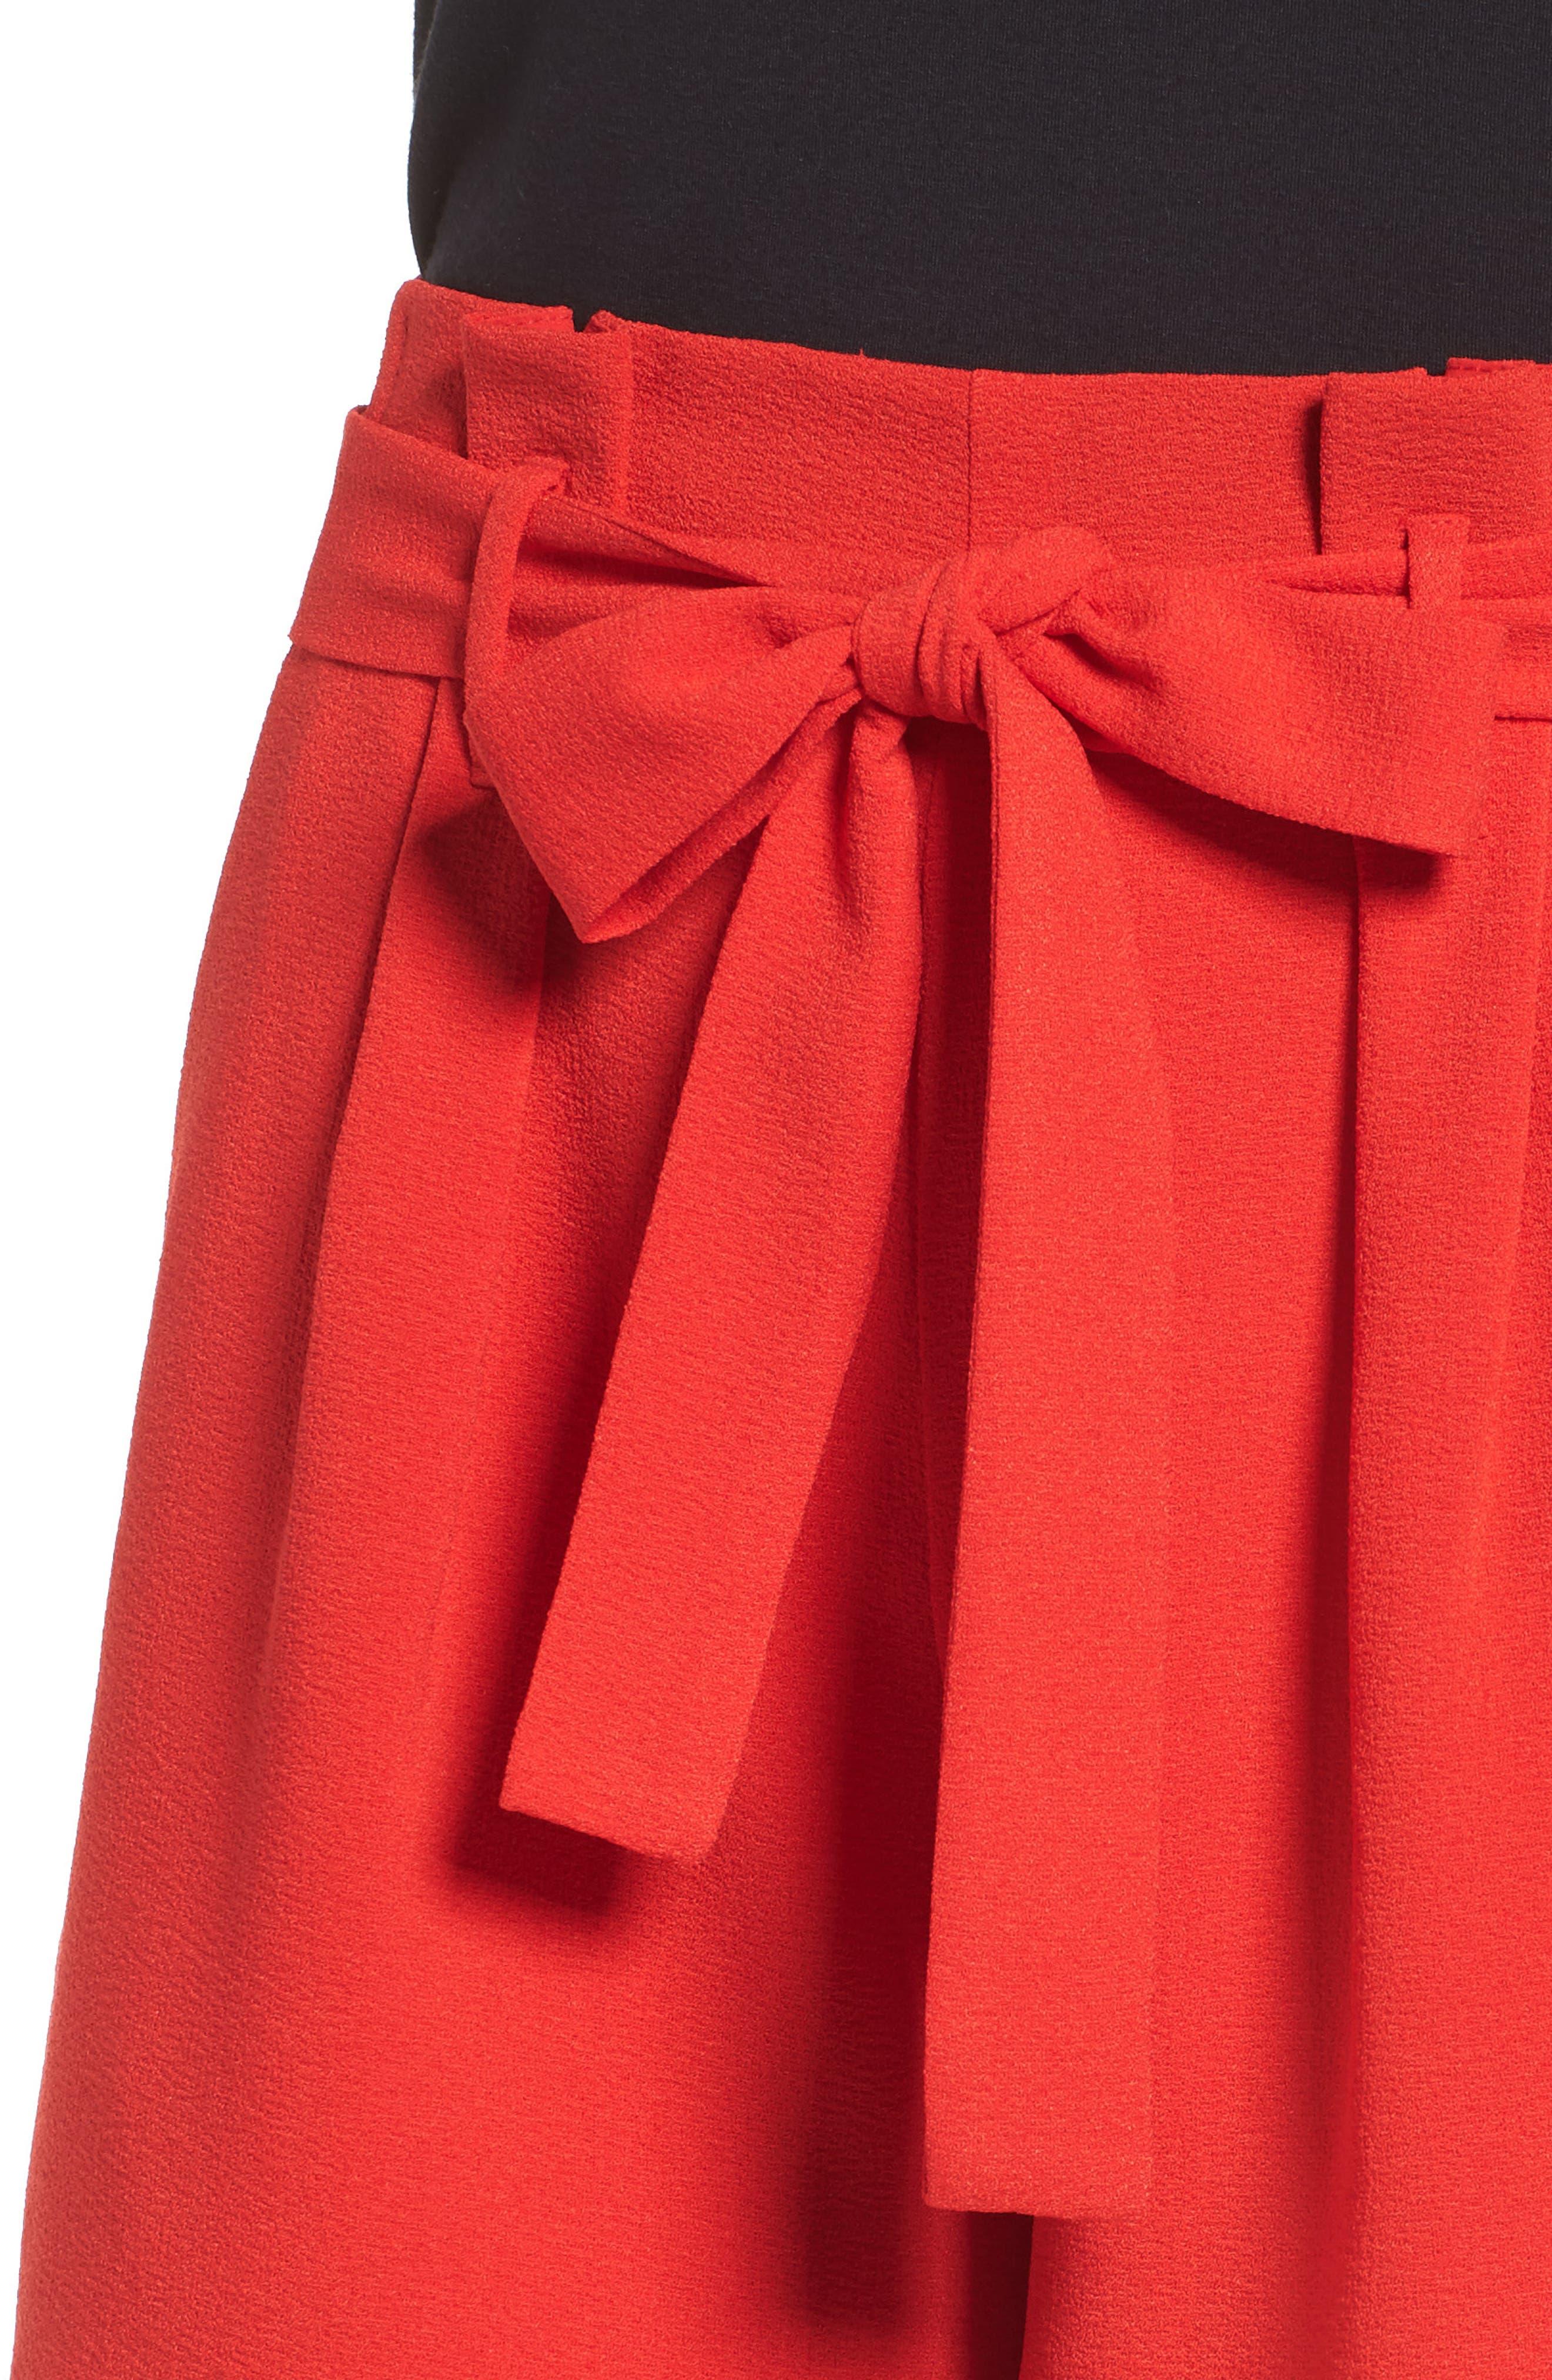 Tie Waist Shorts,                             Alternate thumbnail 4, color,                             RED LIPSTICK